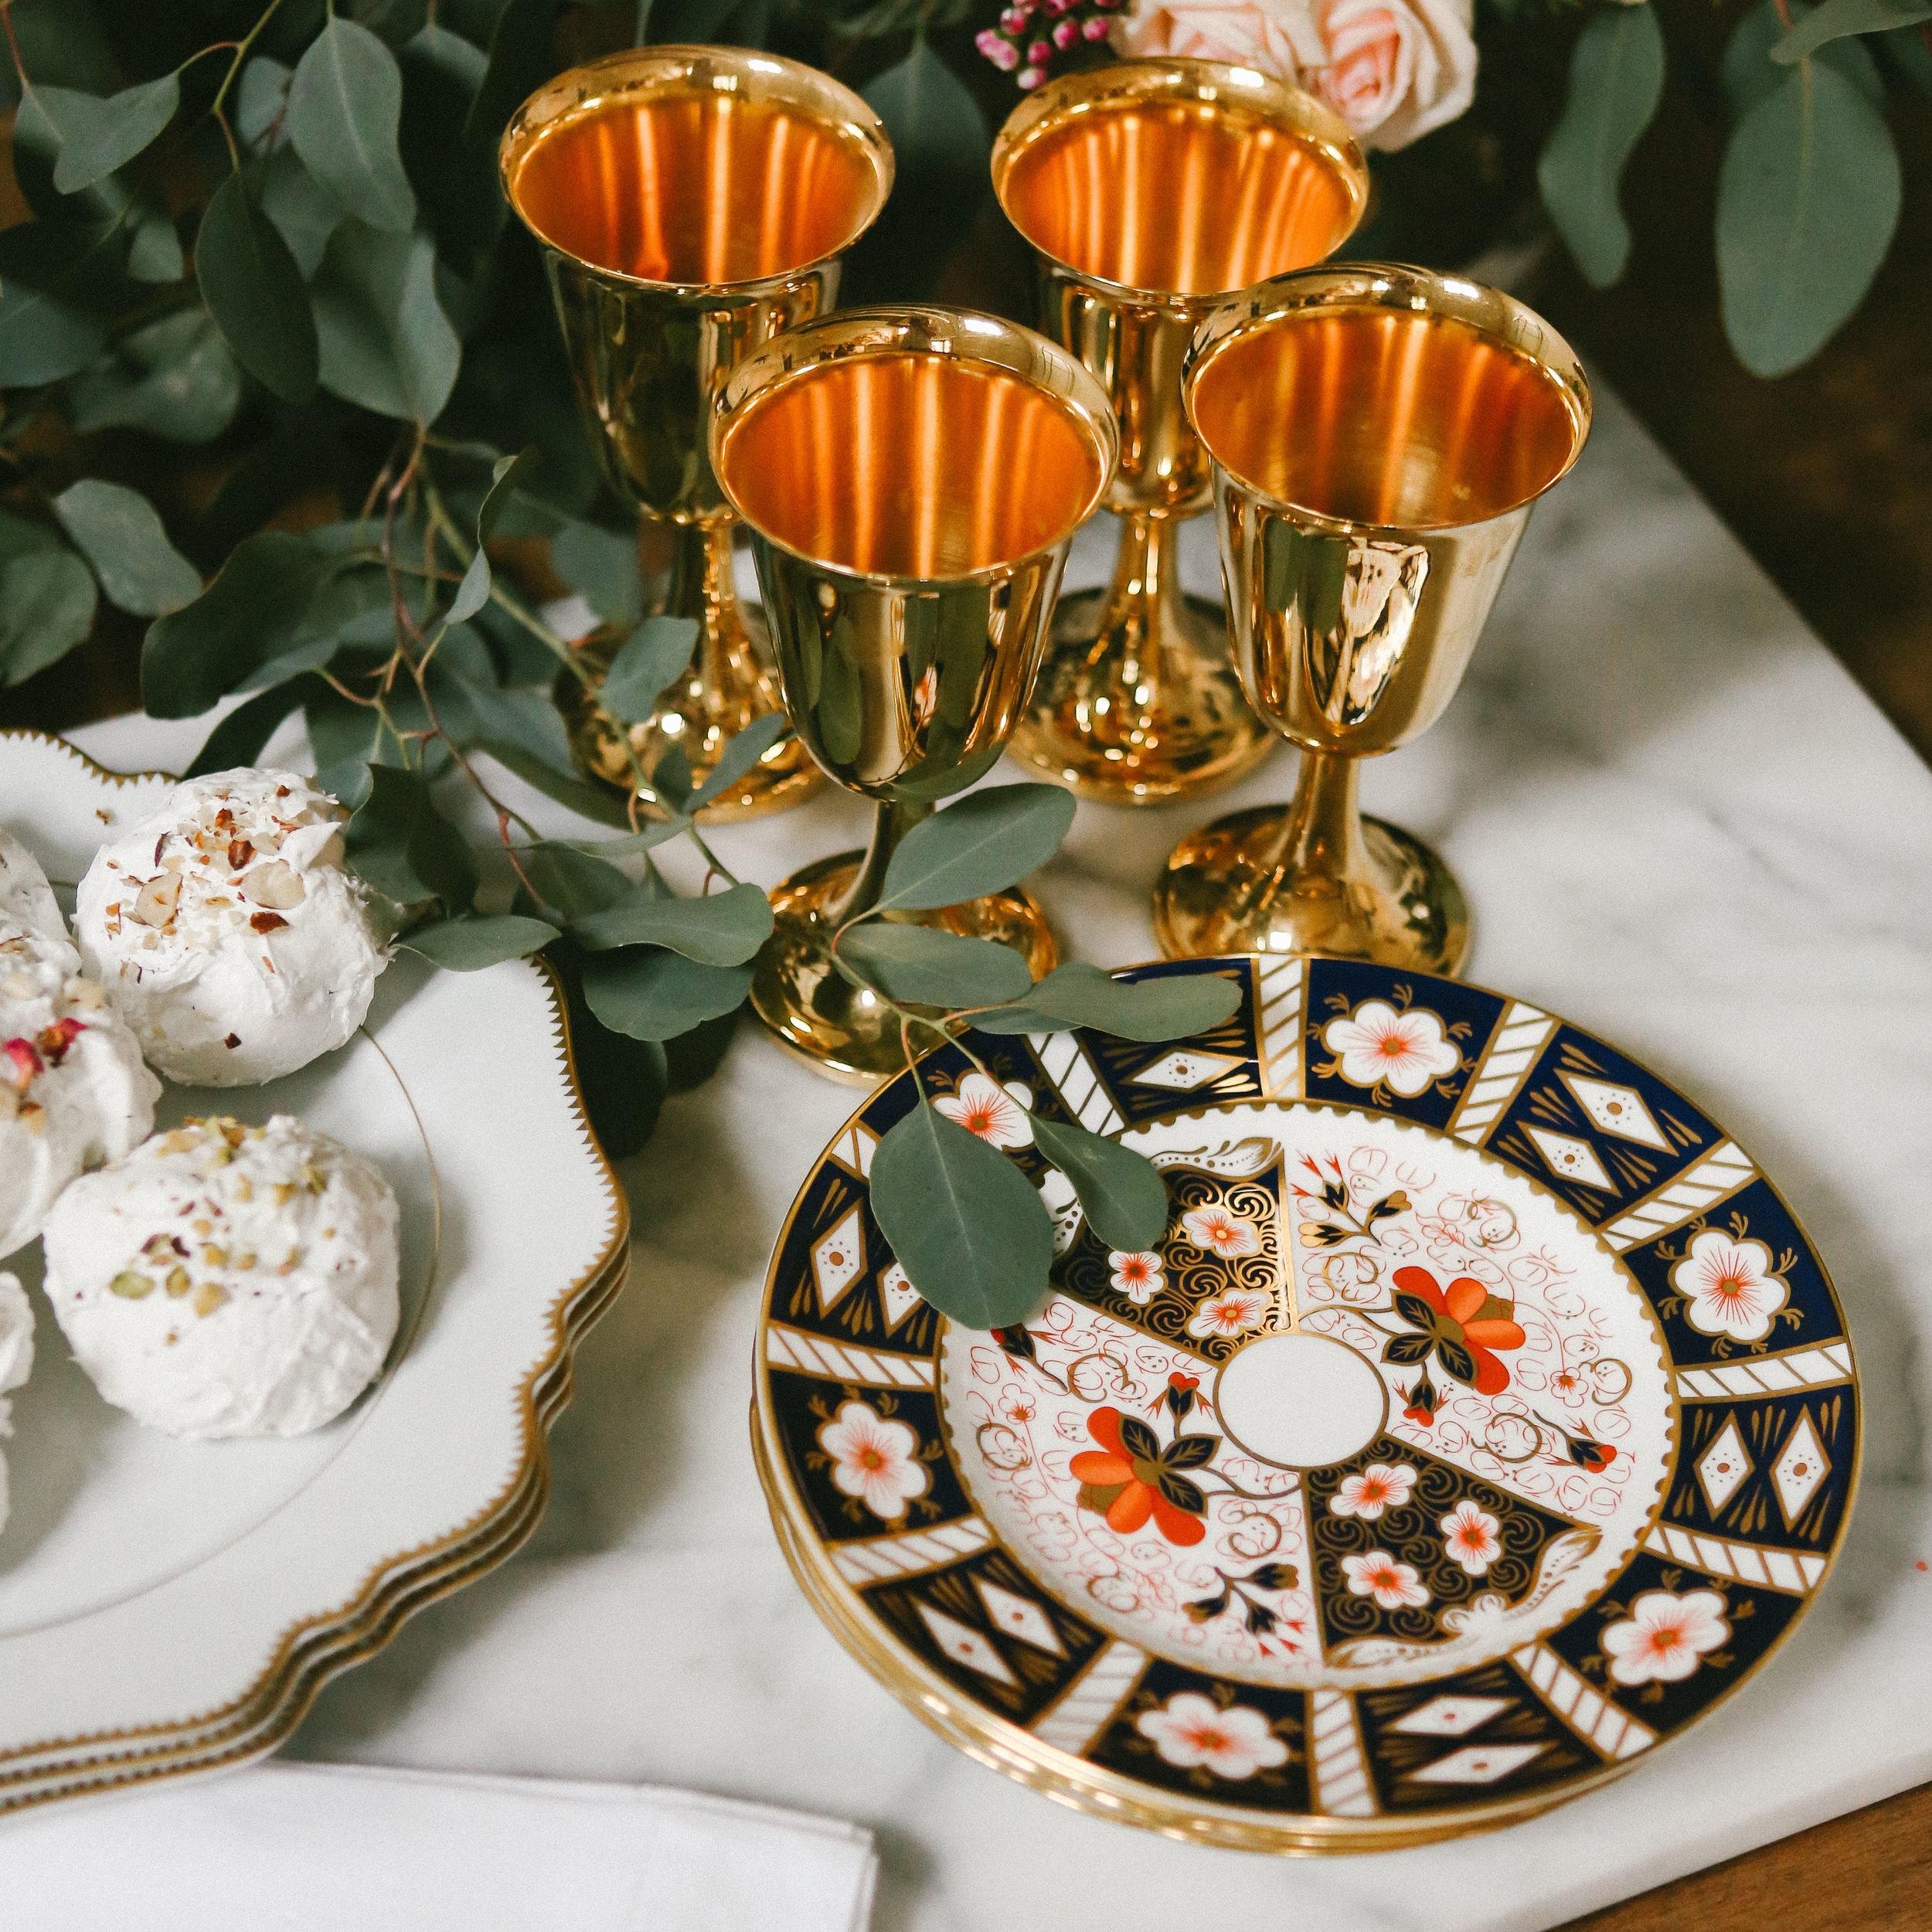 finery-styling-coordinating-fineryboutique-event-planning-alabama-tennessee-weddingplanner-weddingstylist-wedding-coordinator